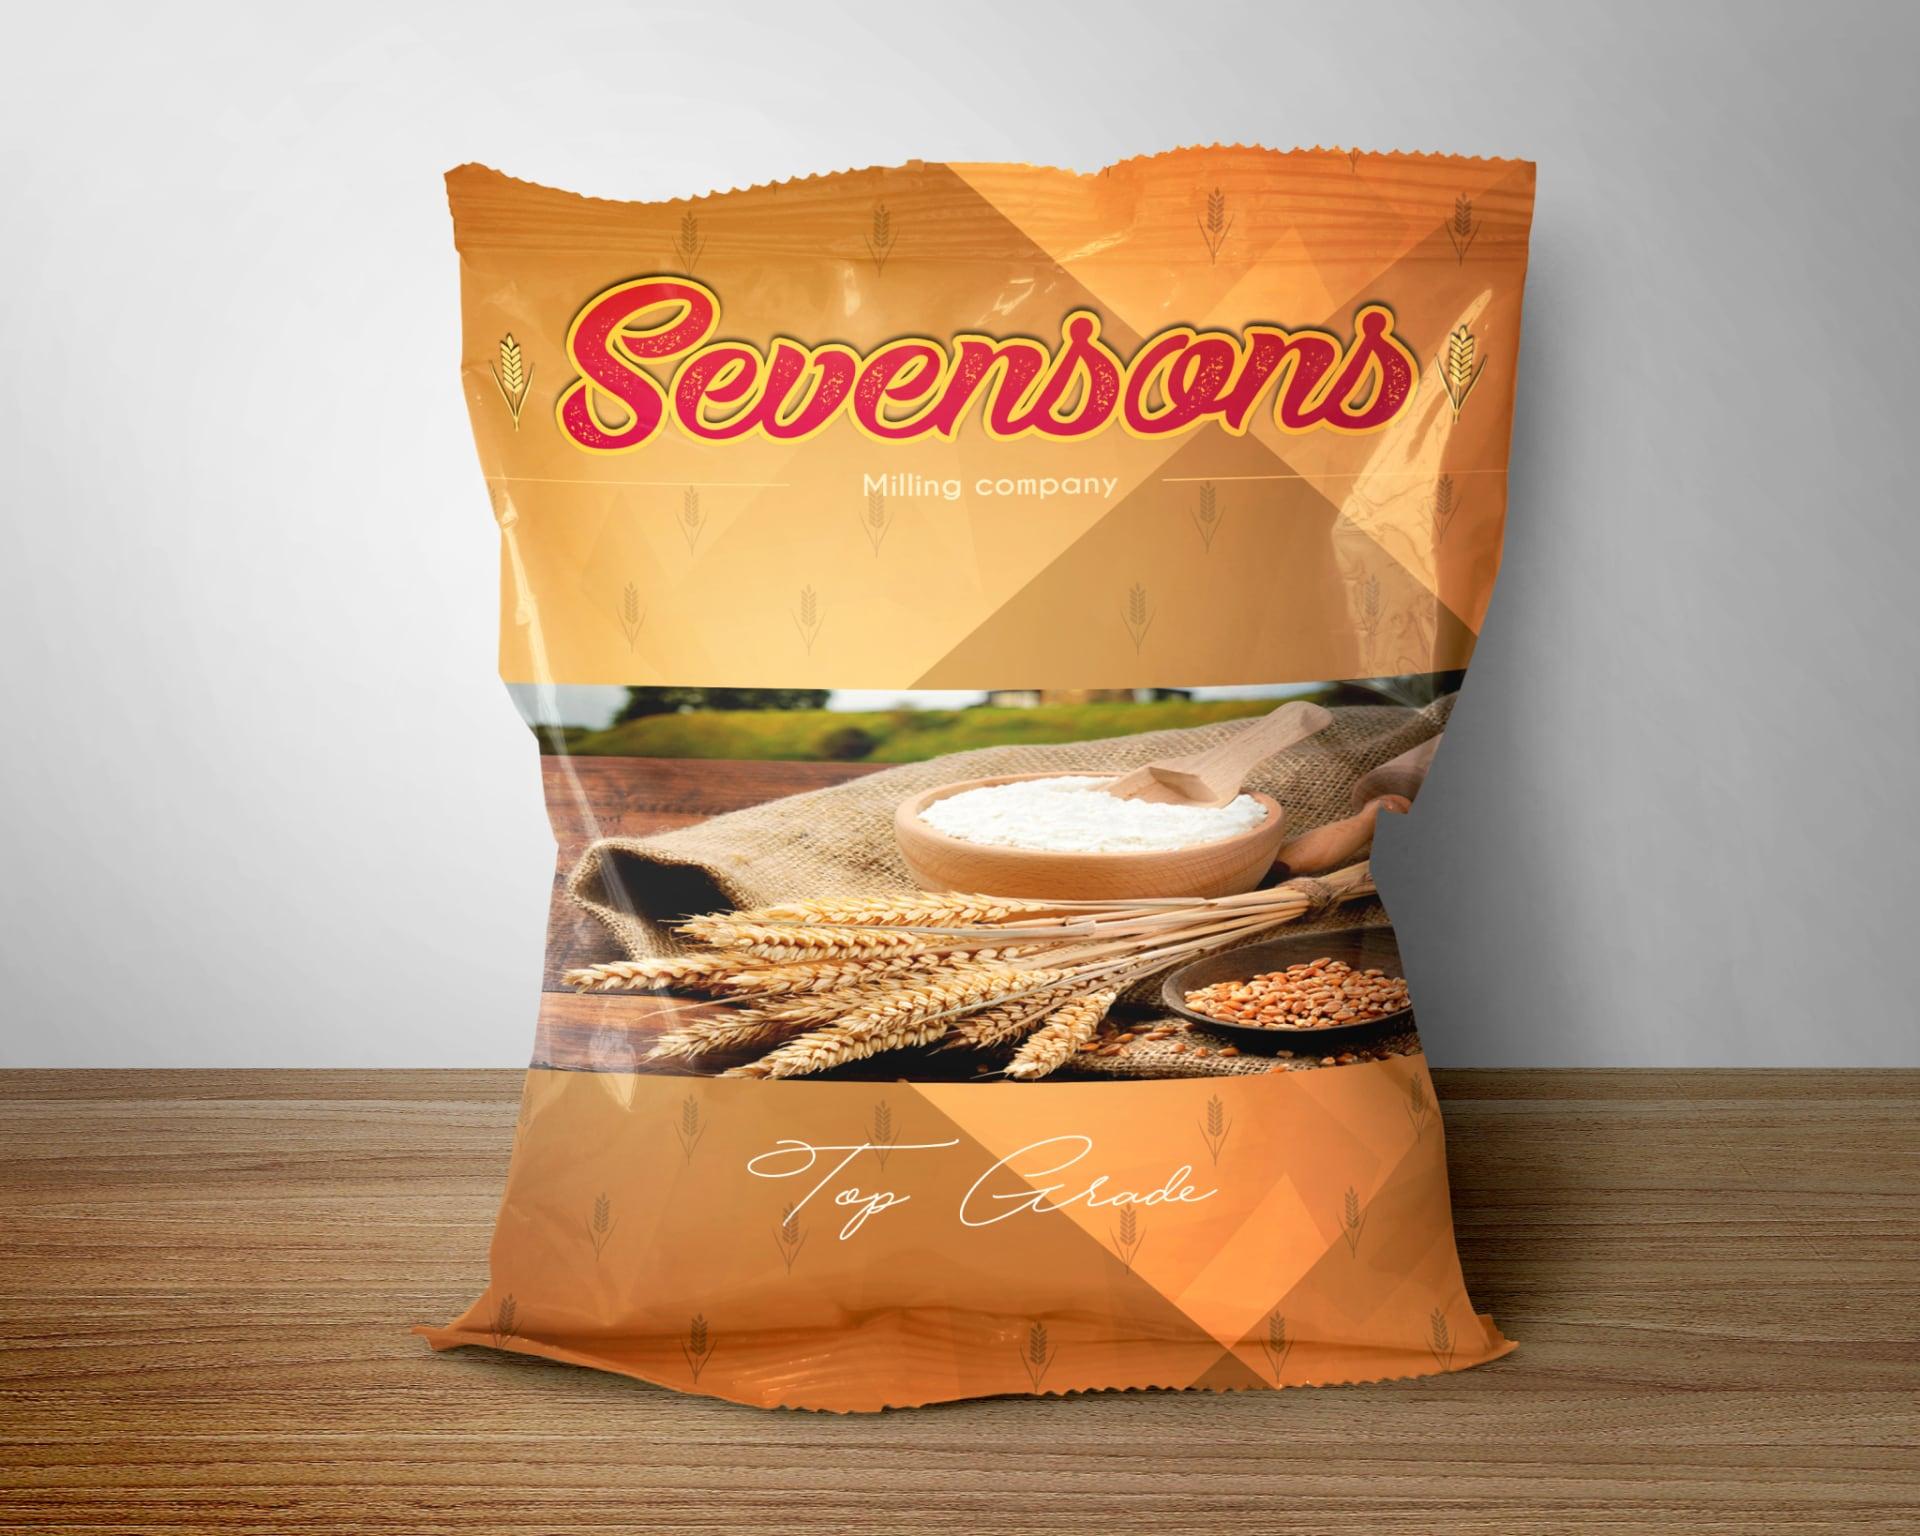 sevensons_milling_company_wzbkup